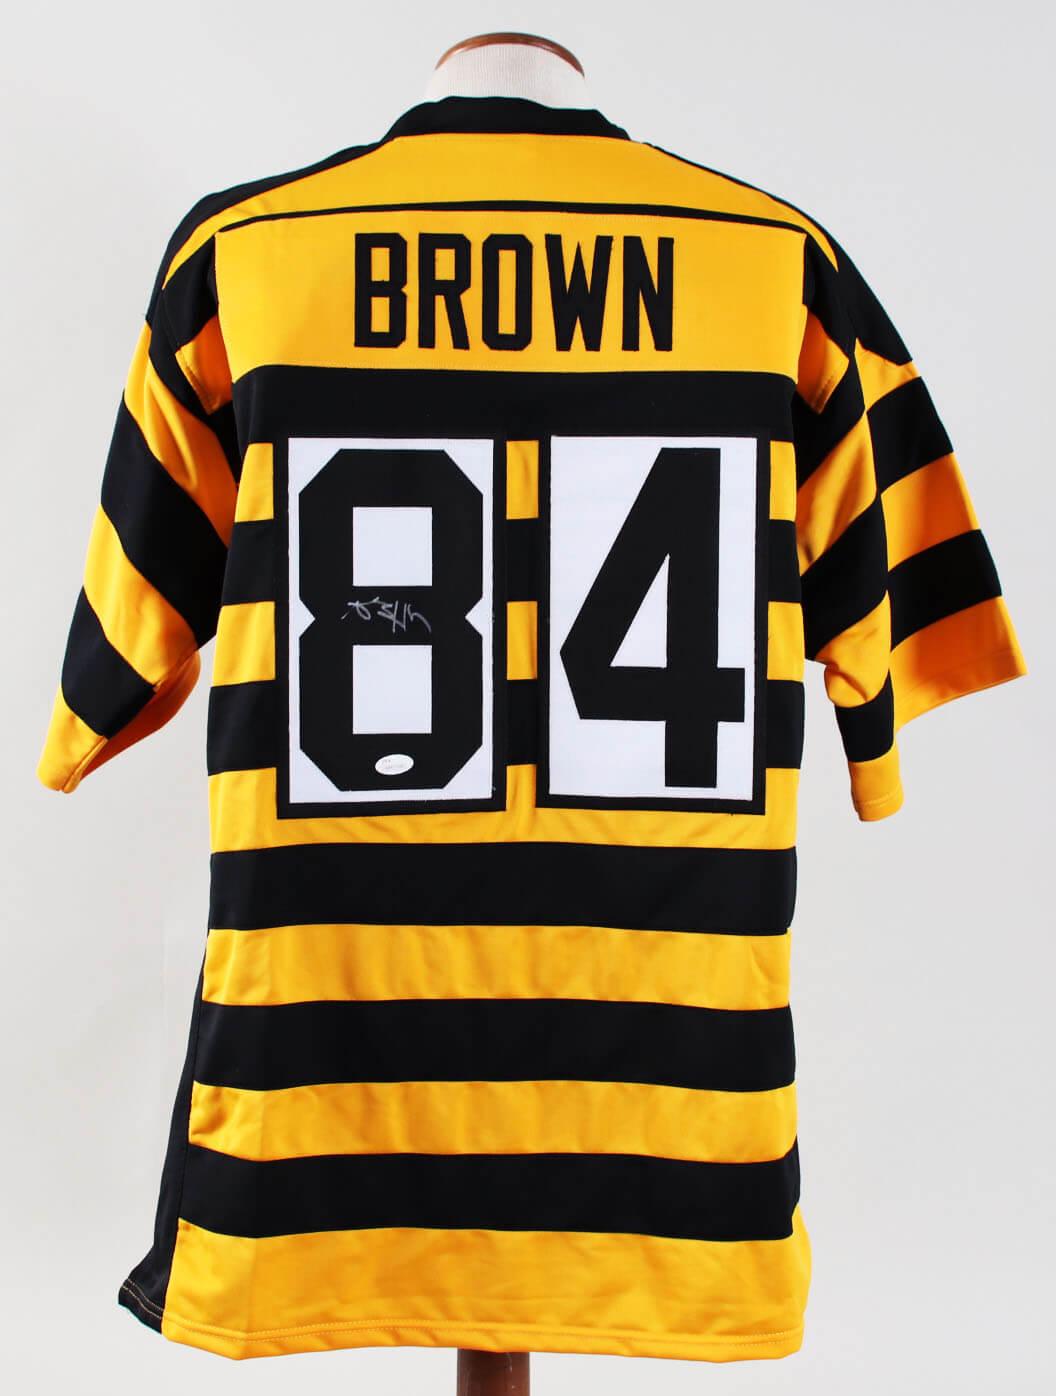 size 40 b3bde 06bef Antonio Brown Signed Jersey Steelers – COA JSA ...